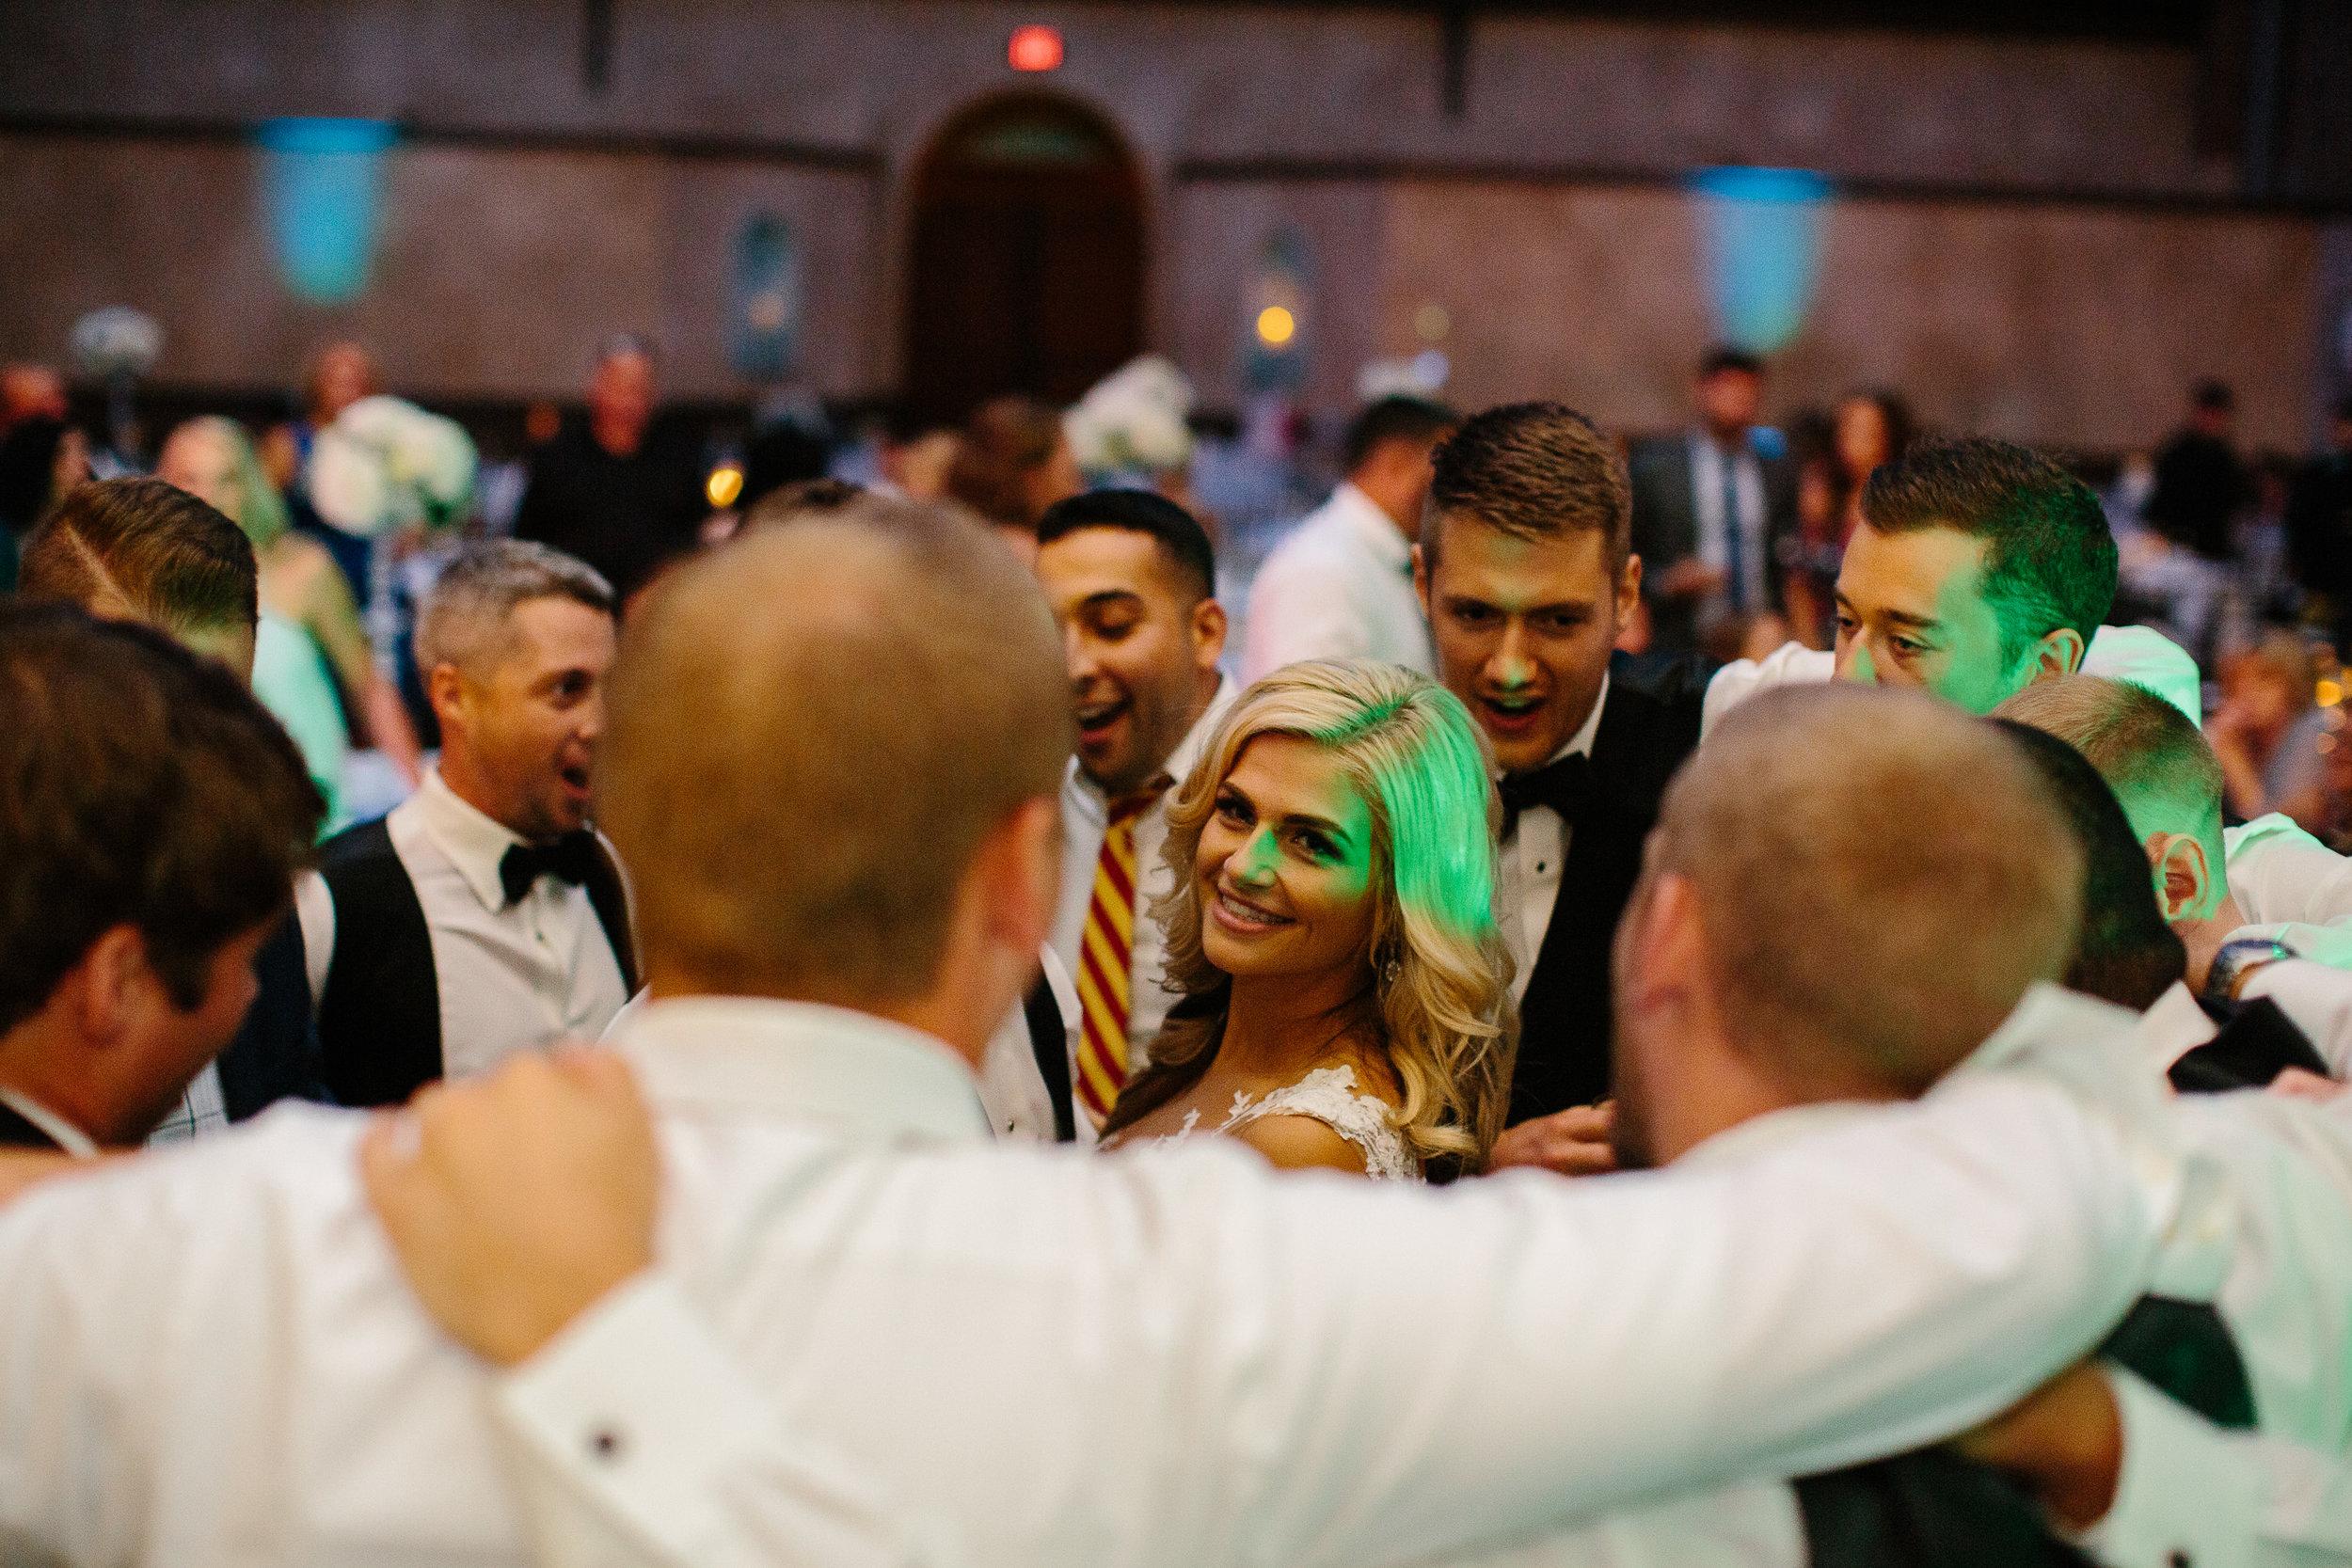 0756_20170819 Randi and Chance Wedding.jpg